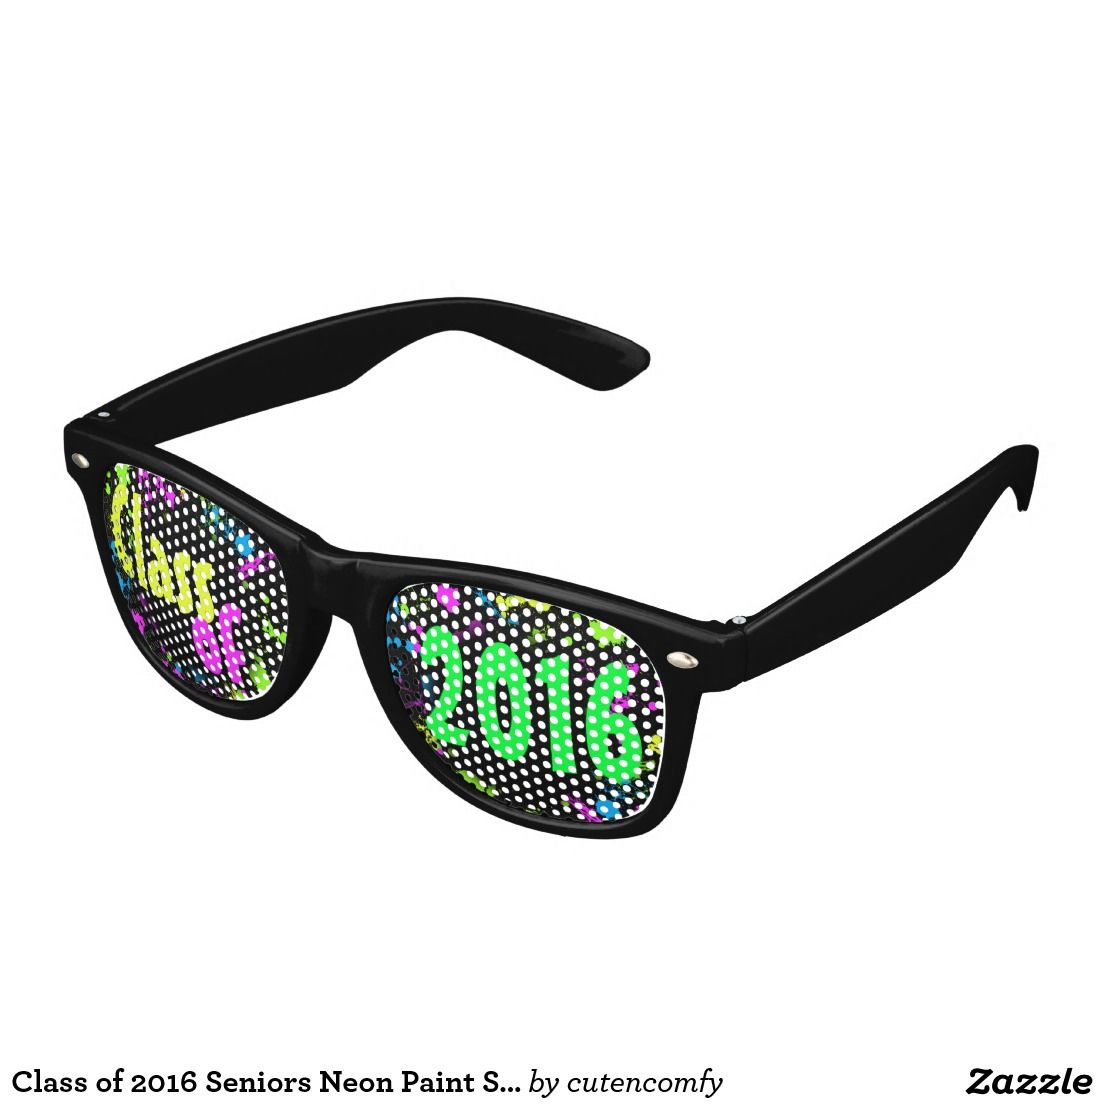 Class of 2016 Seniors Neon Paint Splash Graduation Wayfarer Sunglasses